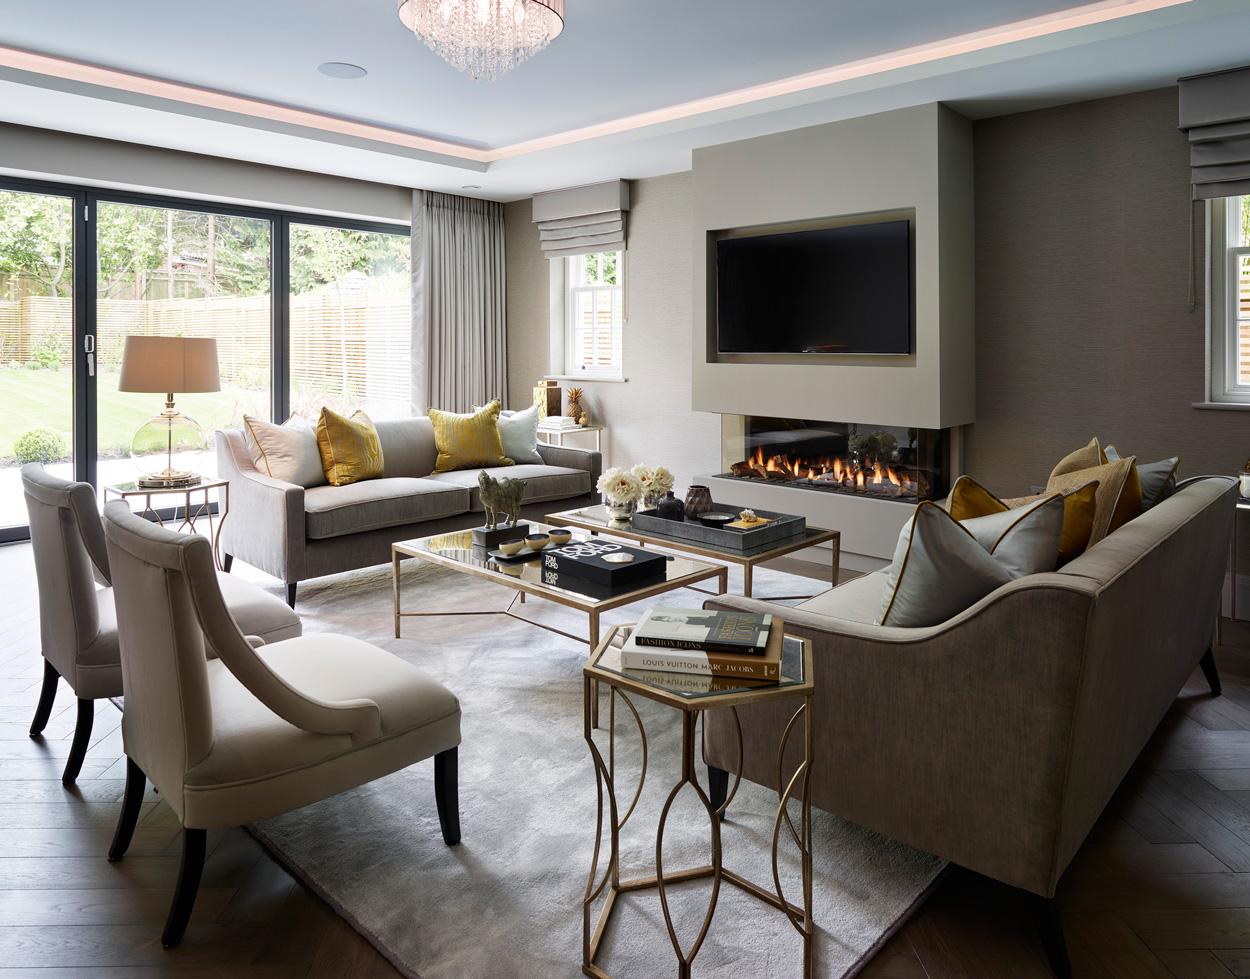 hush design luxury interior designers surrey london